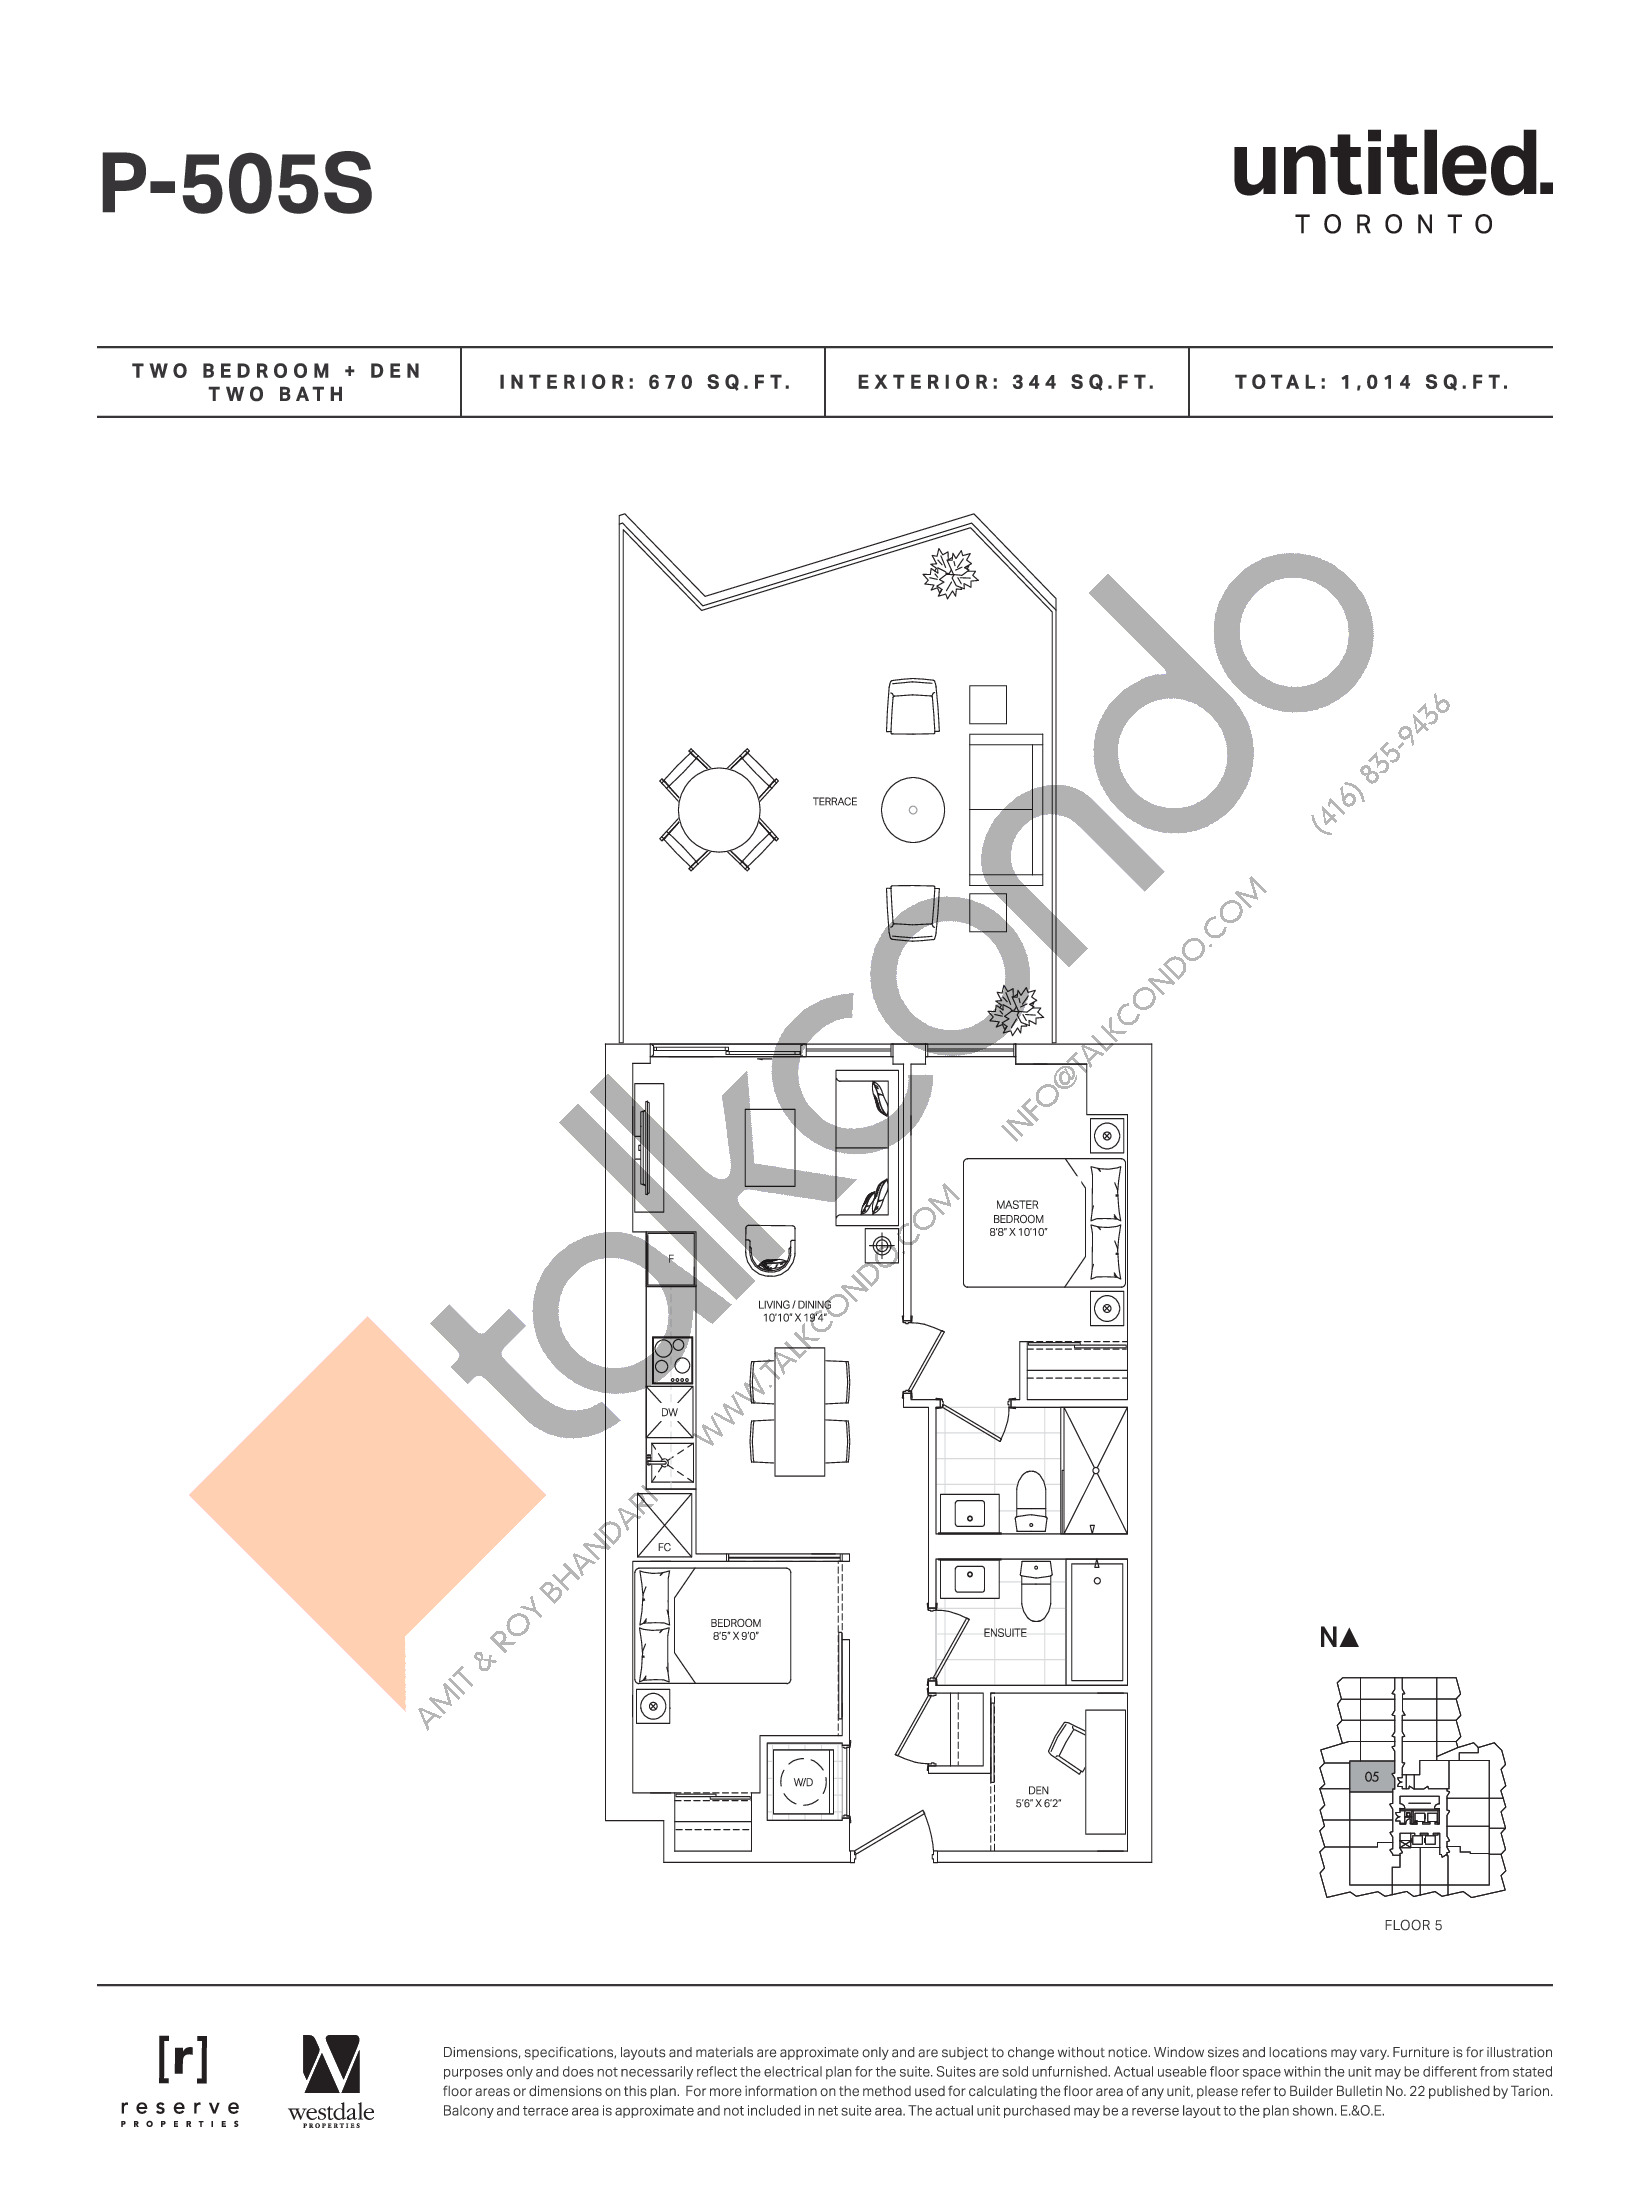 P-505S Floor Plan at Untitled Toronto Condos - 670 sq.ft